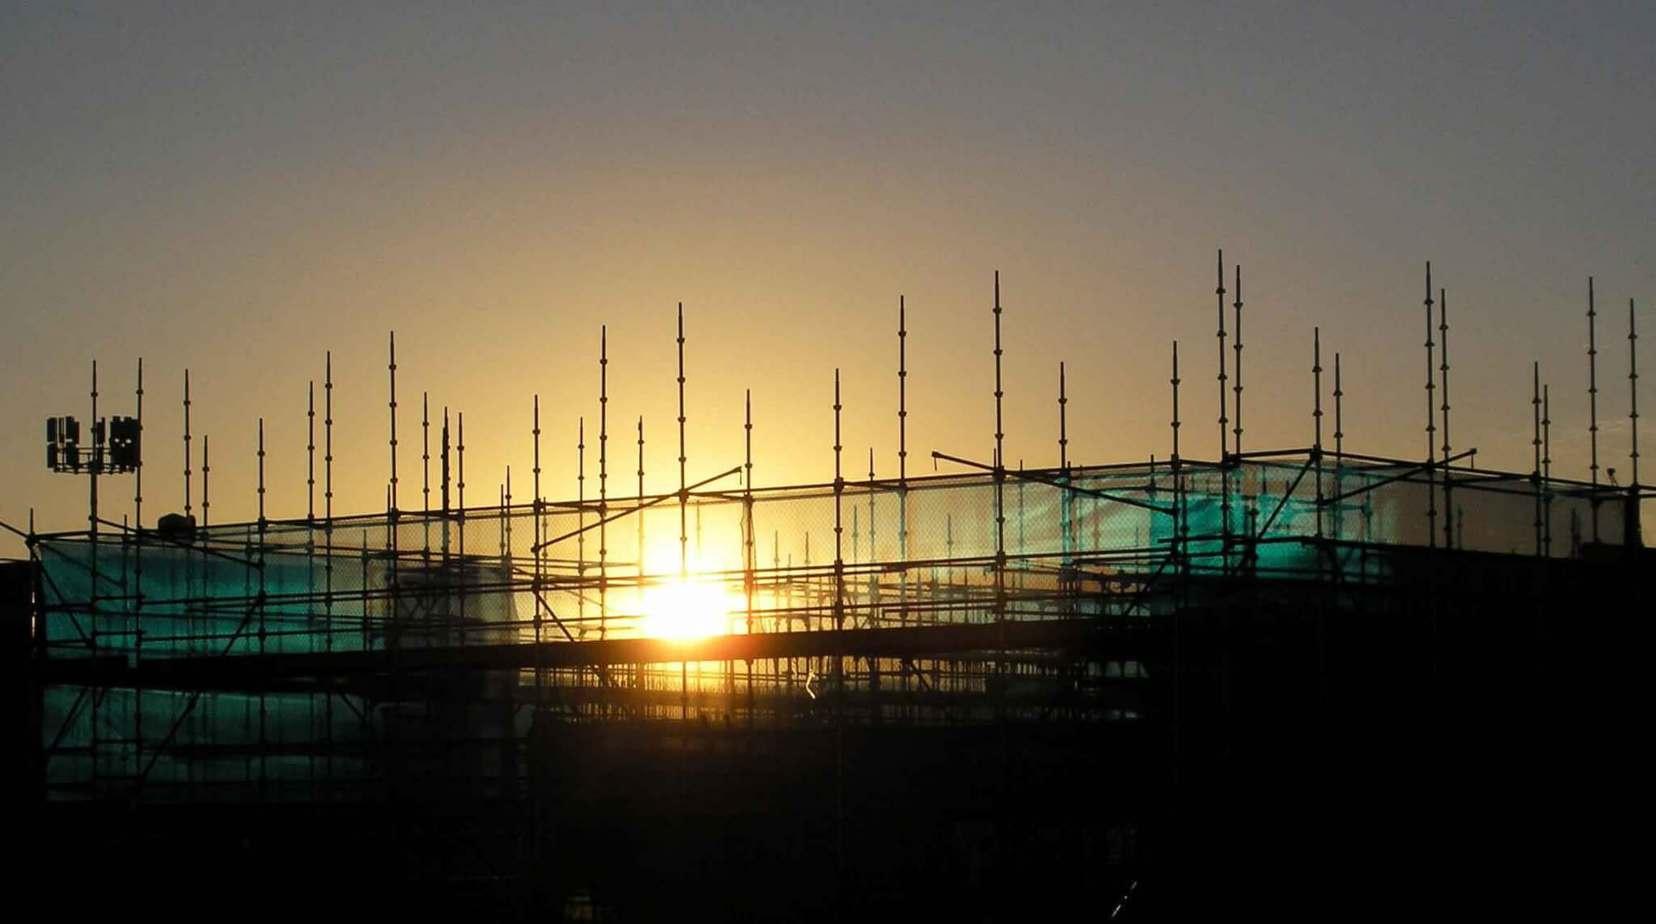 CONSTRUCTION WORK HALTS